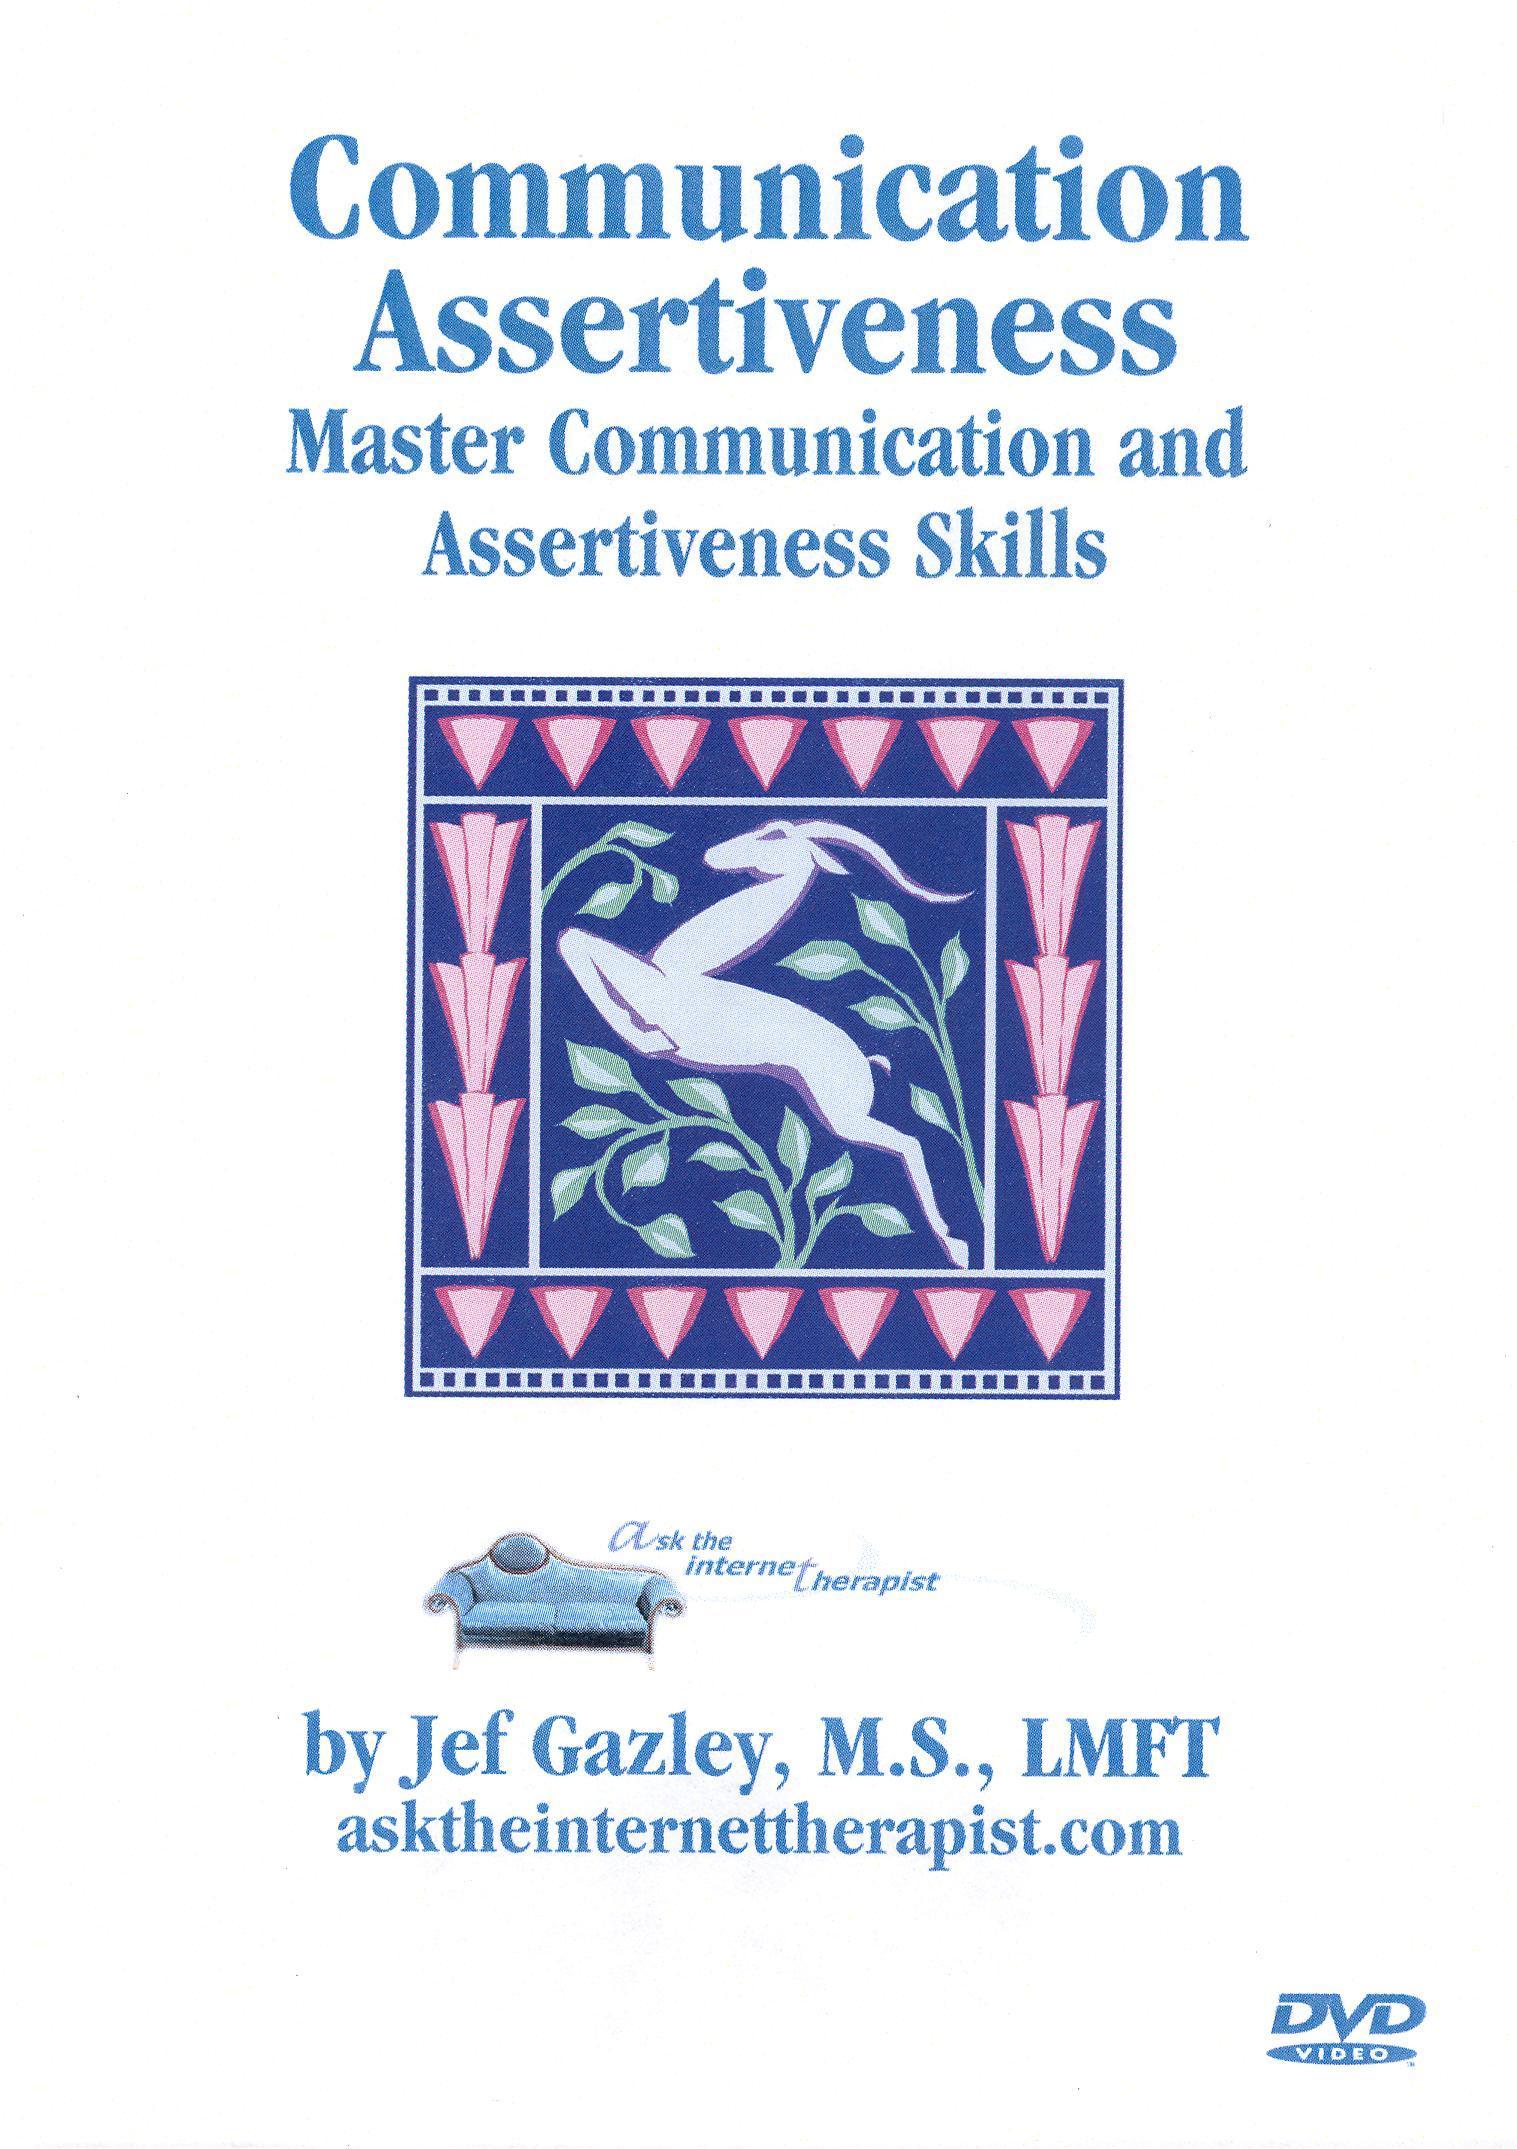 Communication Assertiveness: Master Communication and Assertiveness Training Skills